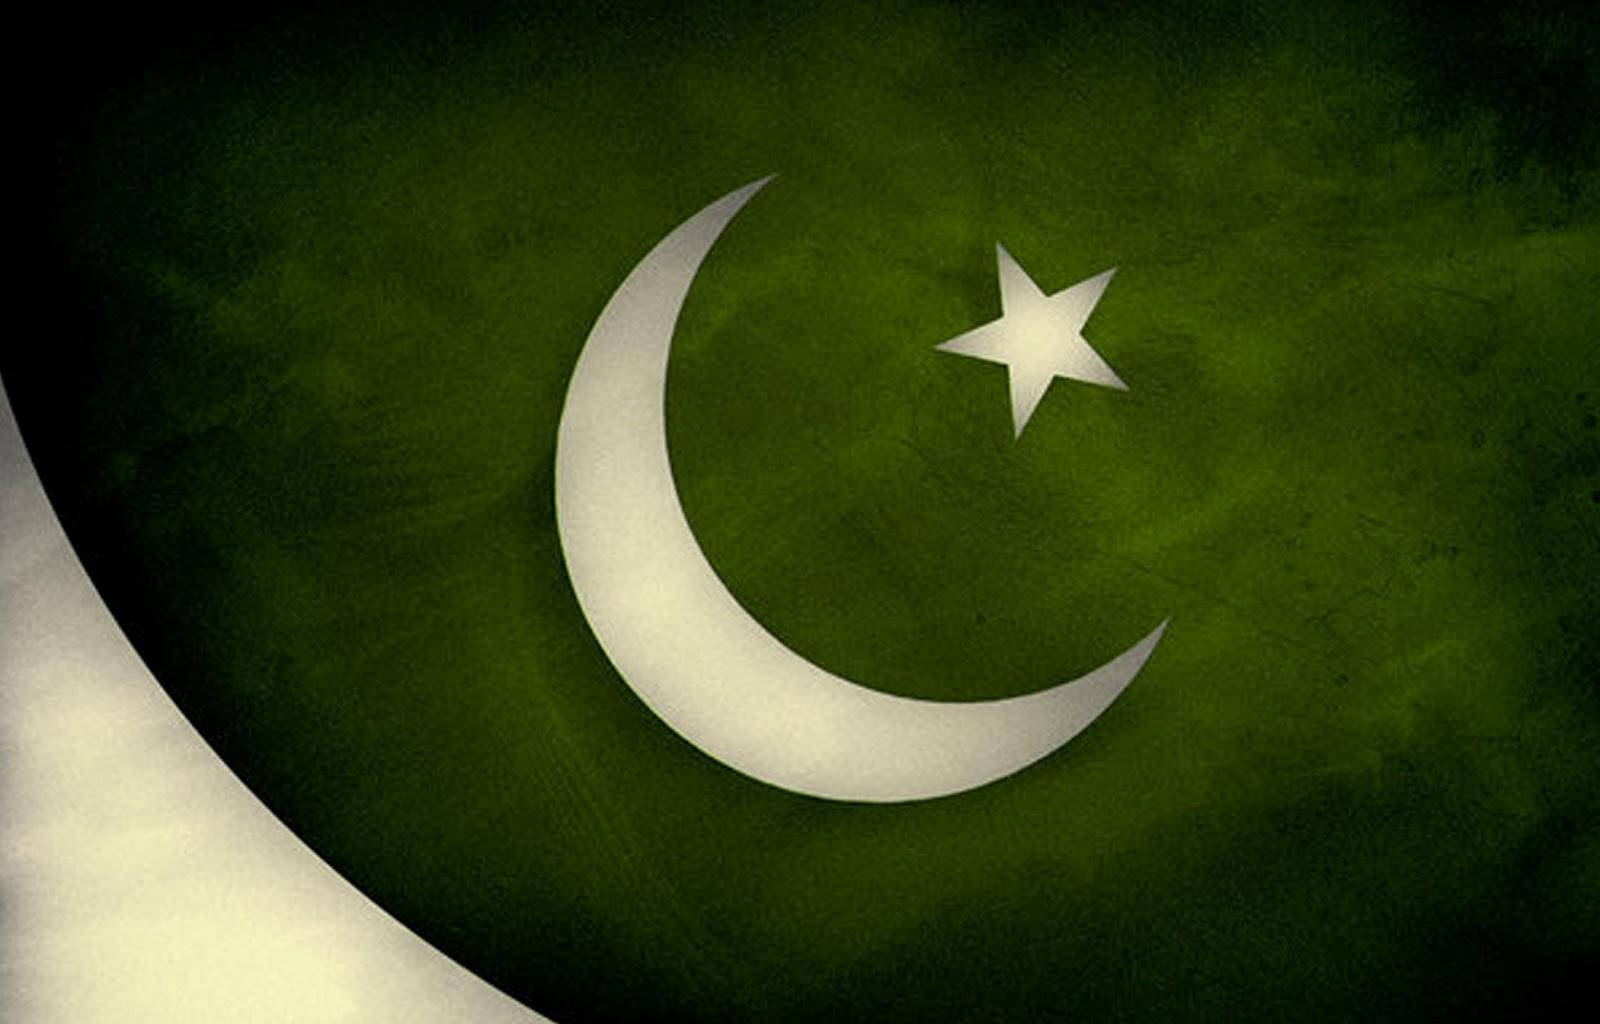 High Resolution Wallpaper | Flag Of Pakistan 1600x1024 px